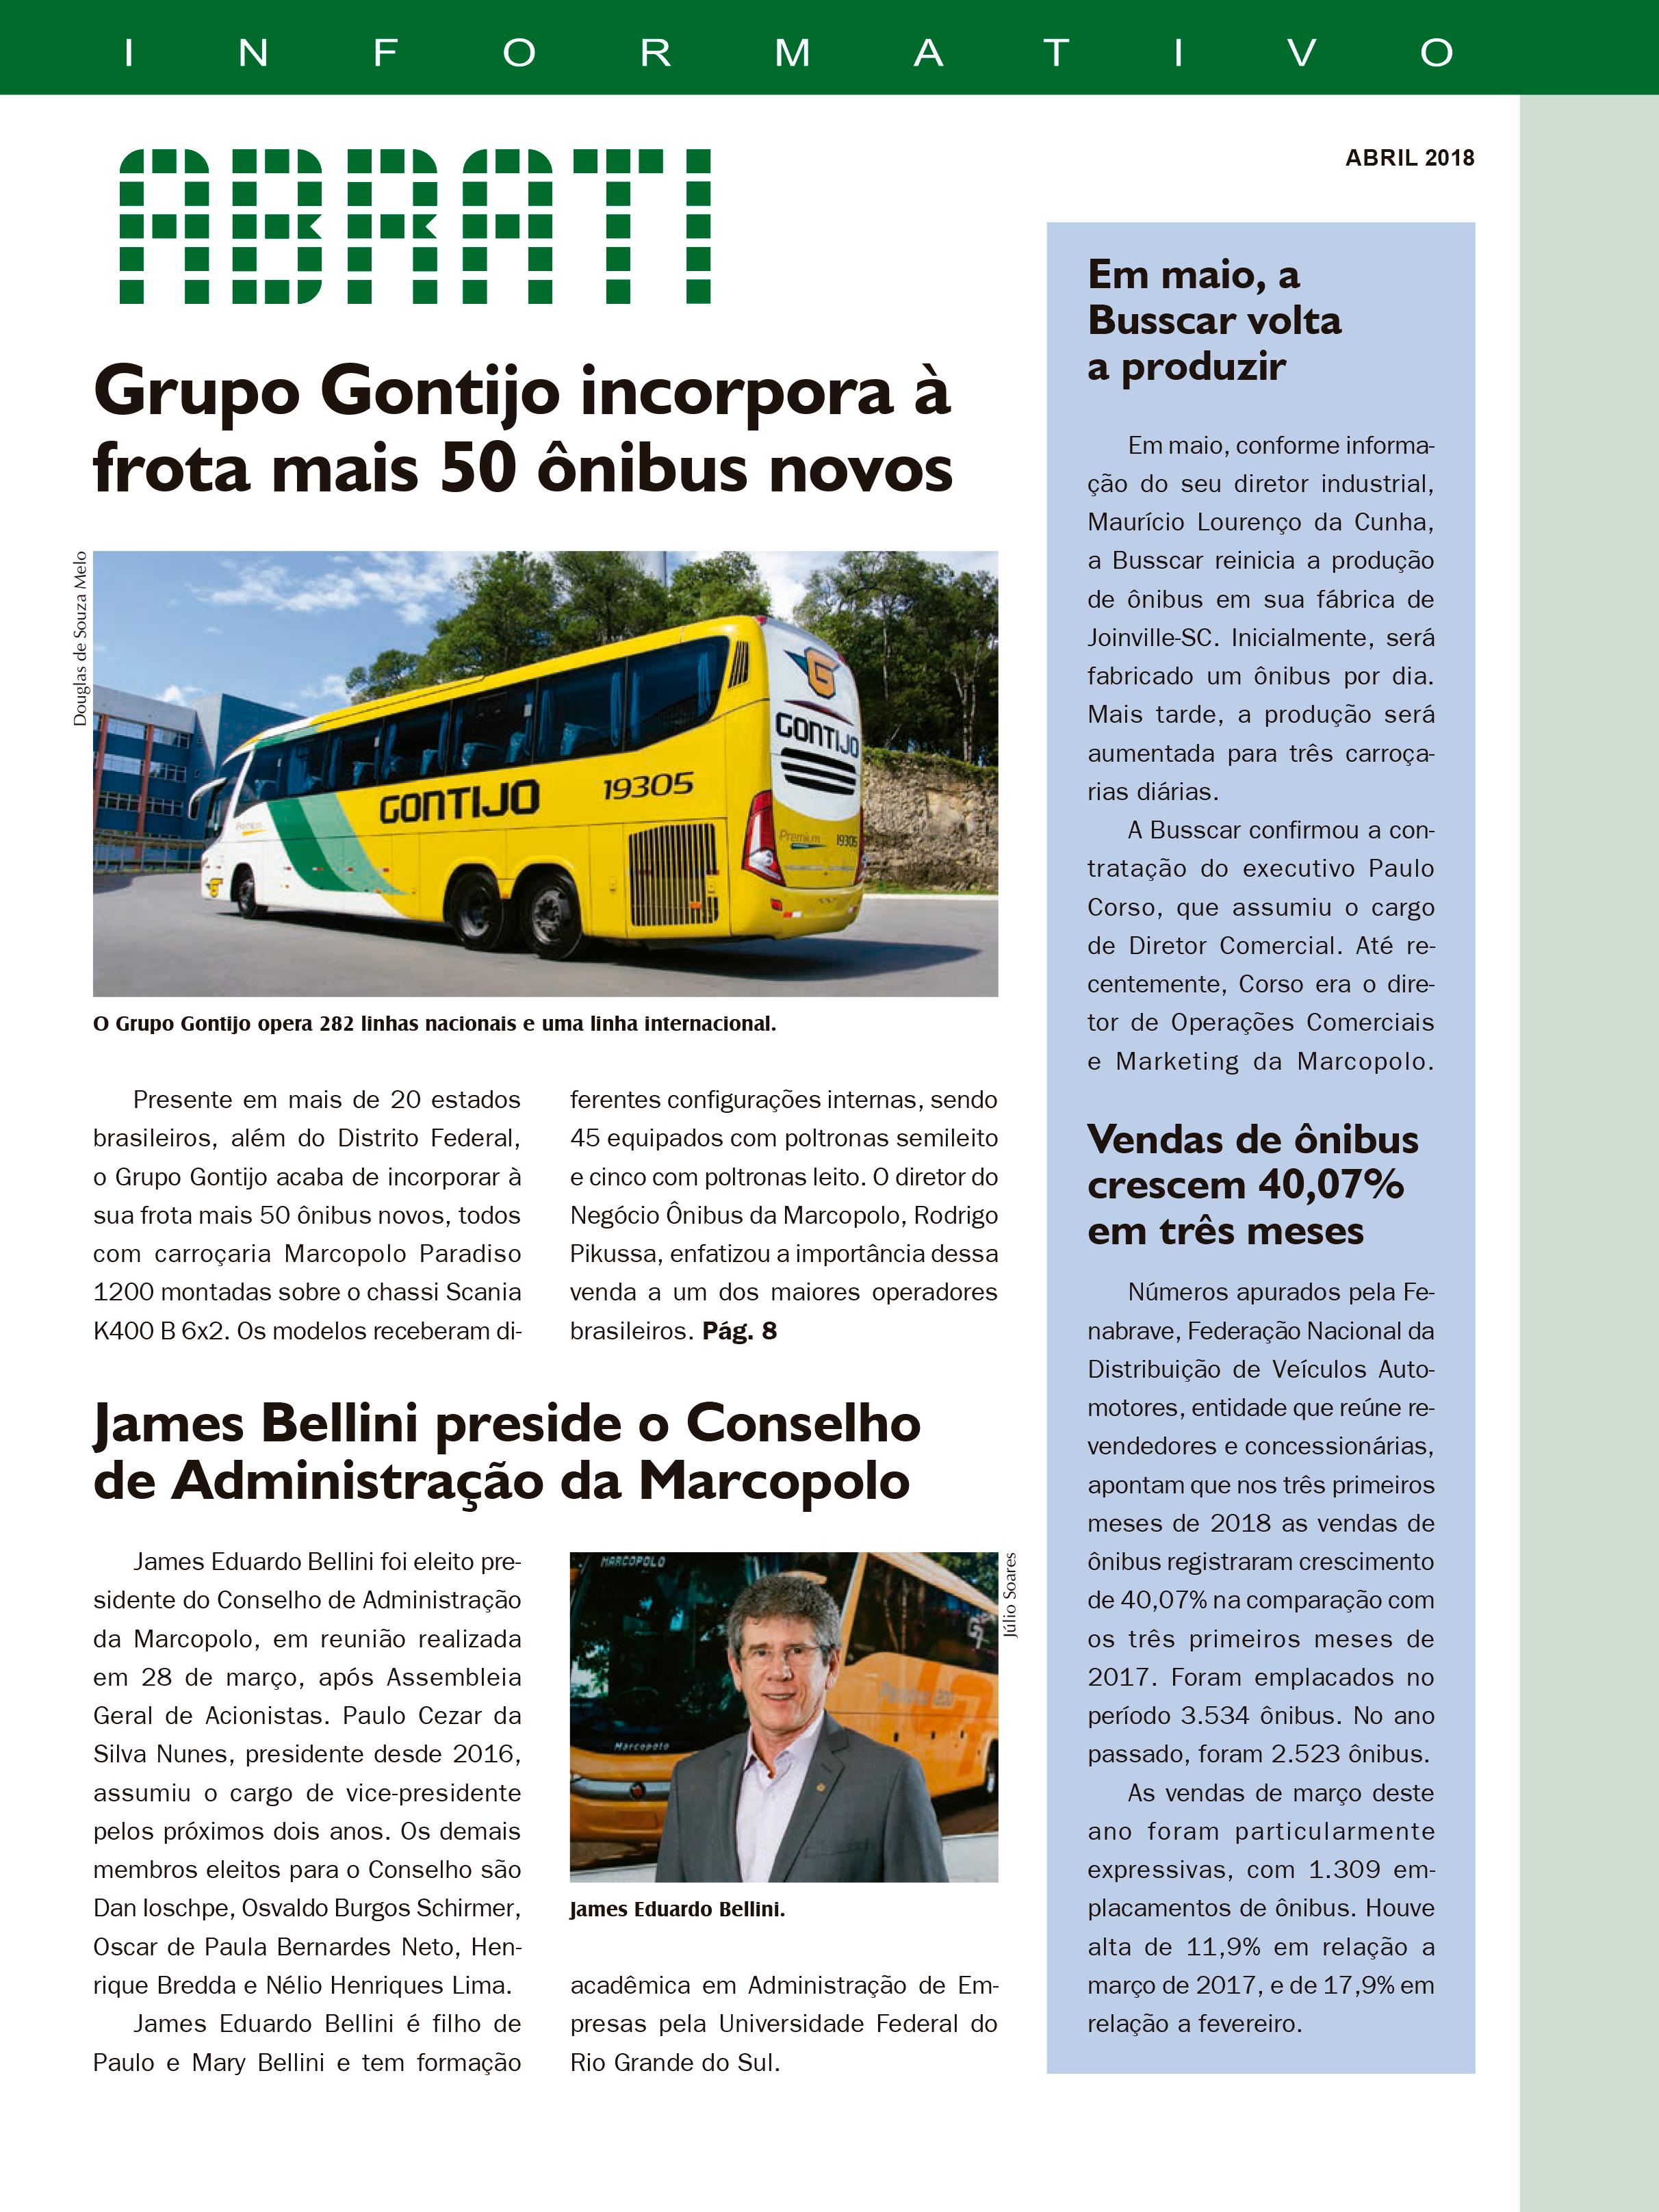 Informativo Abril 2018